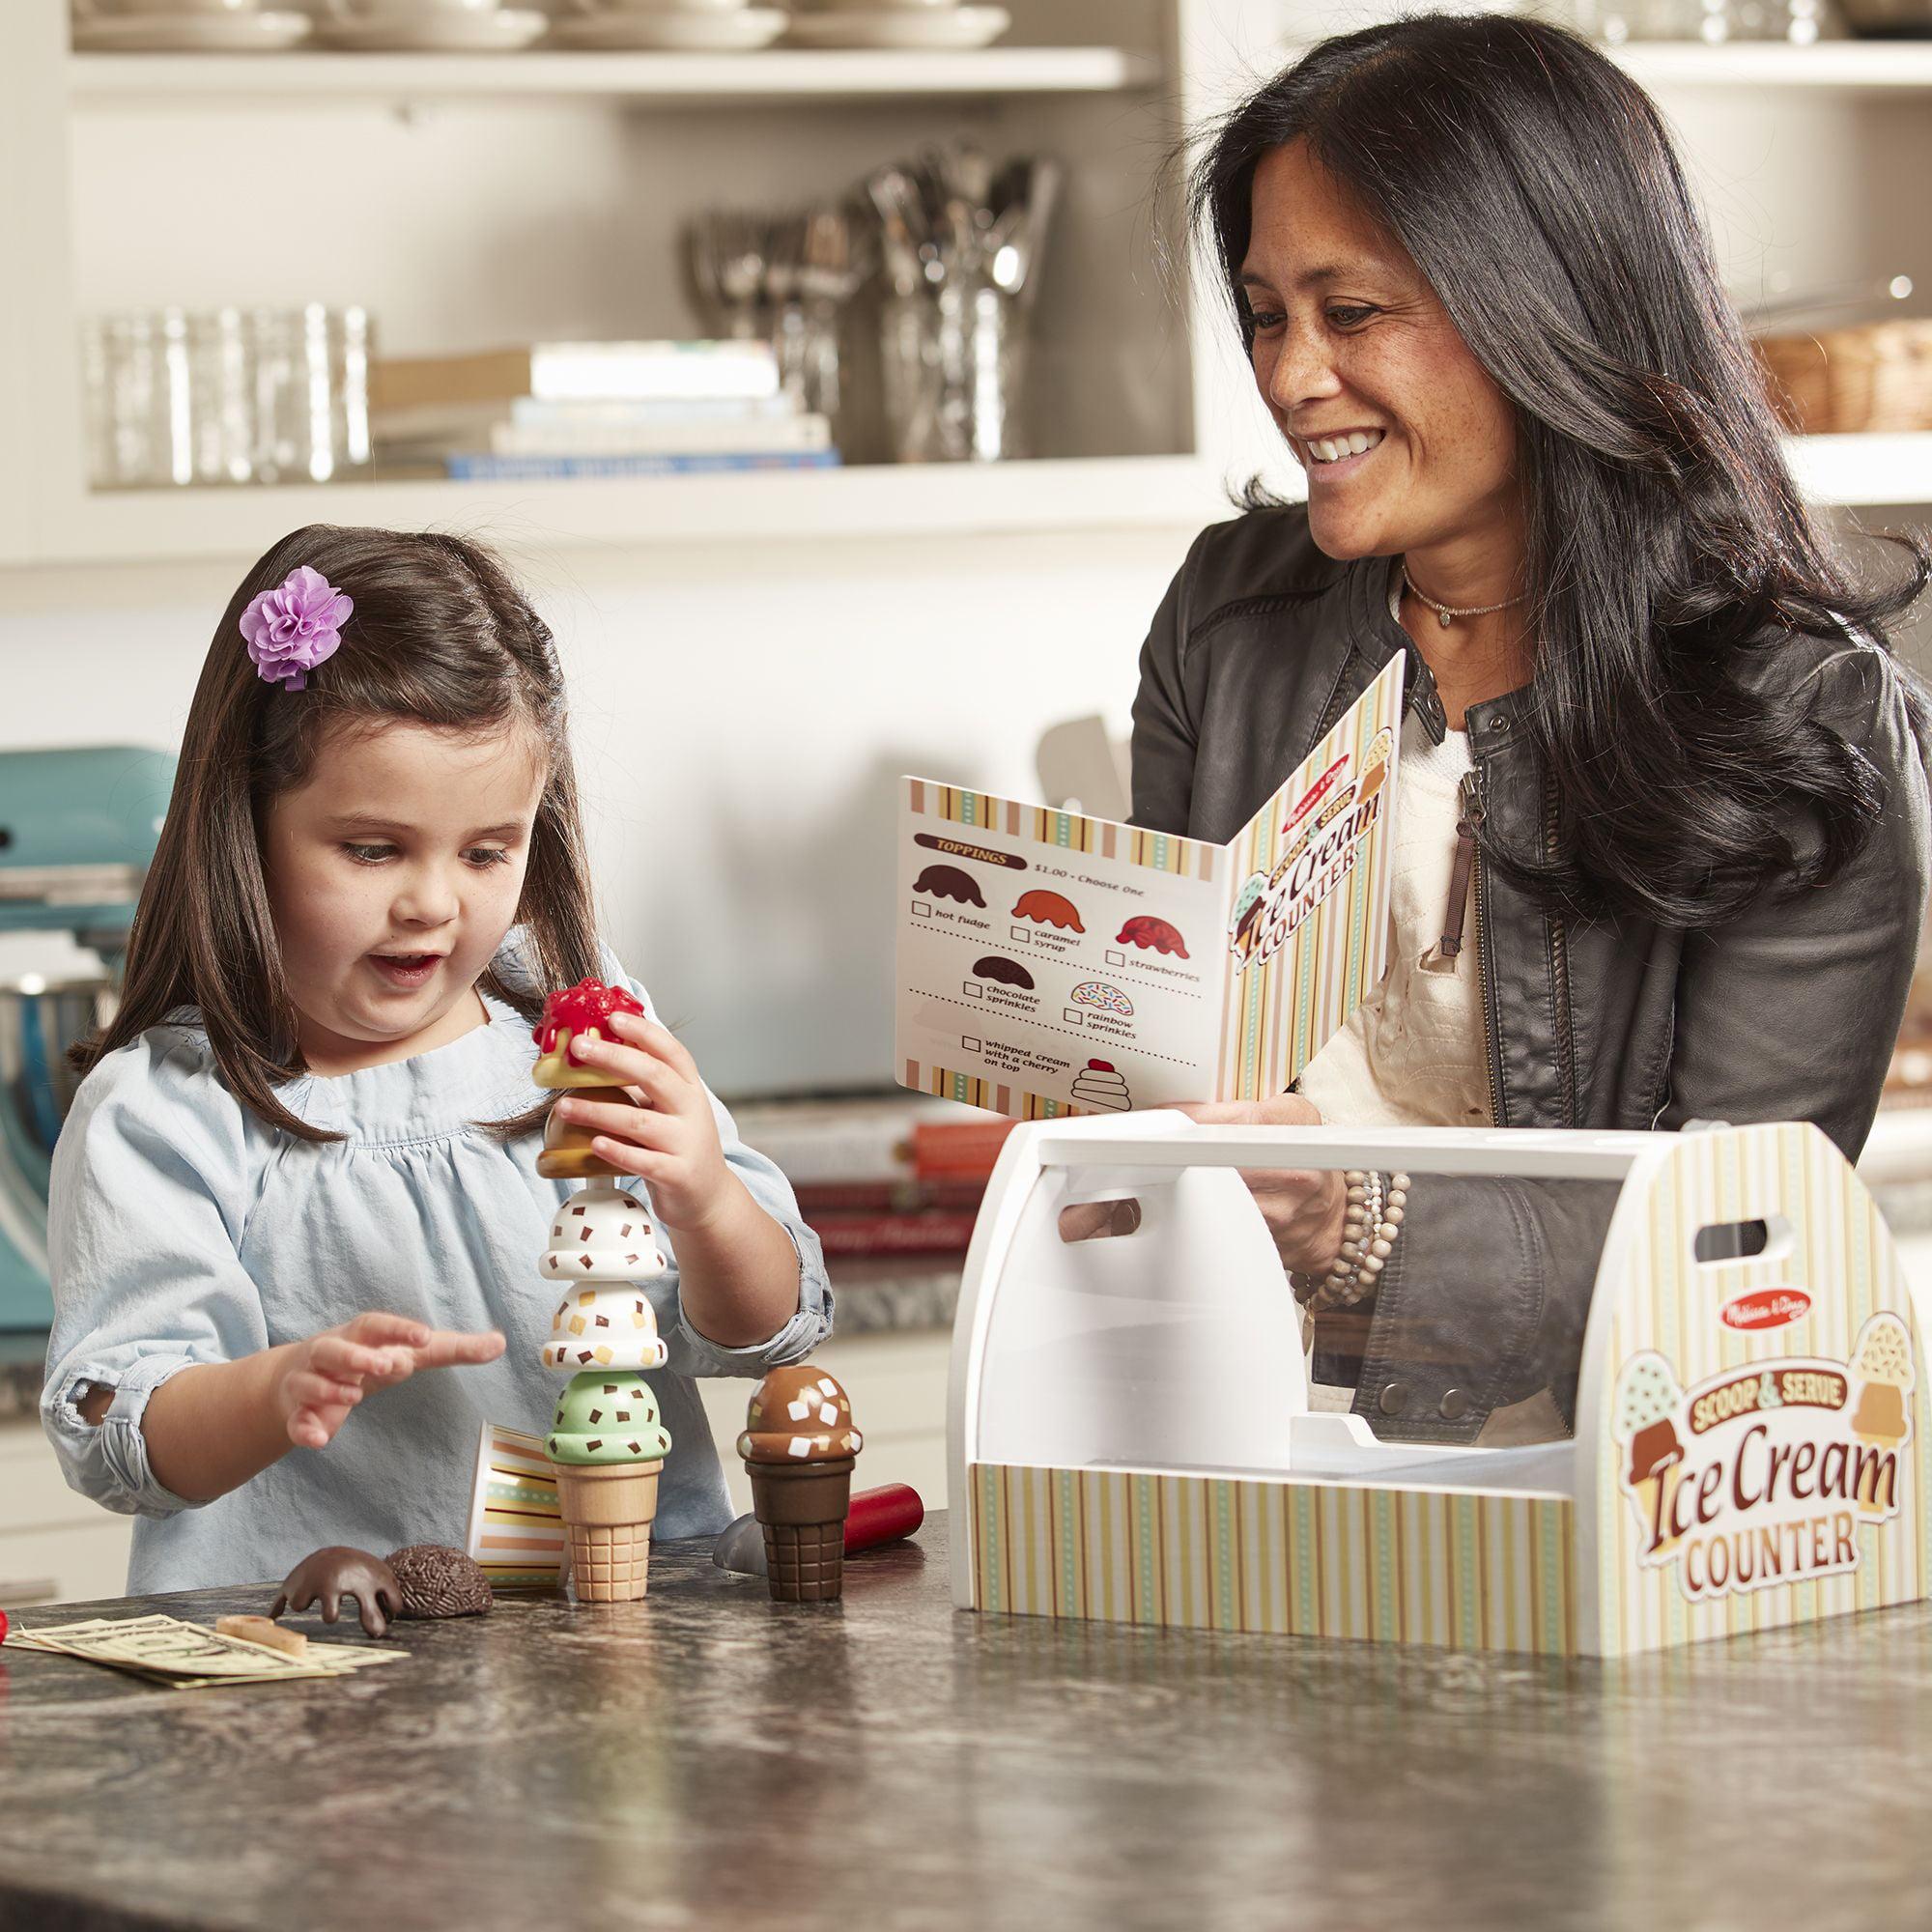 Melissa Doug Wooden Scoop Serve Ice Cream Counter